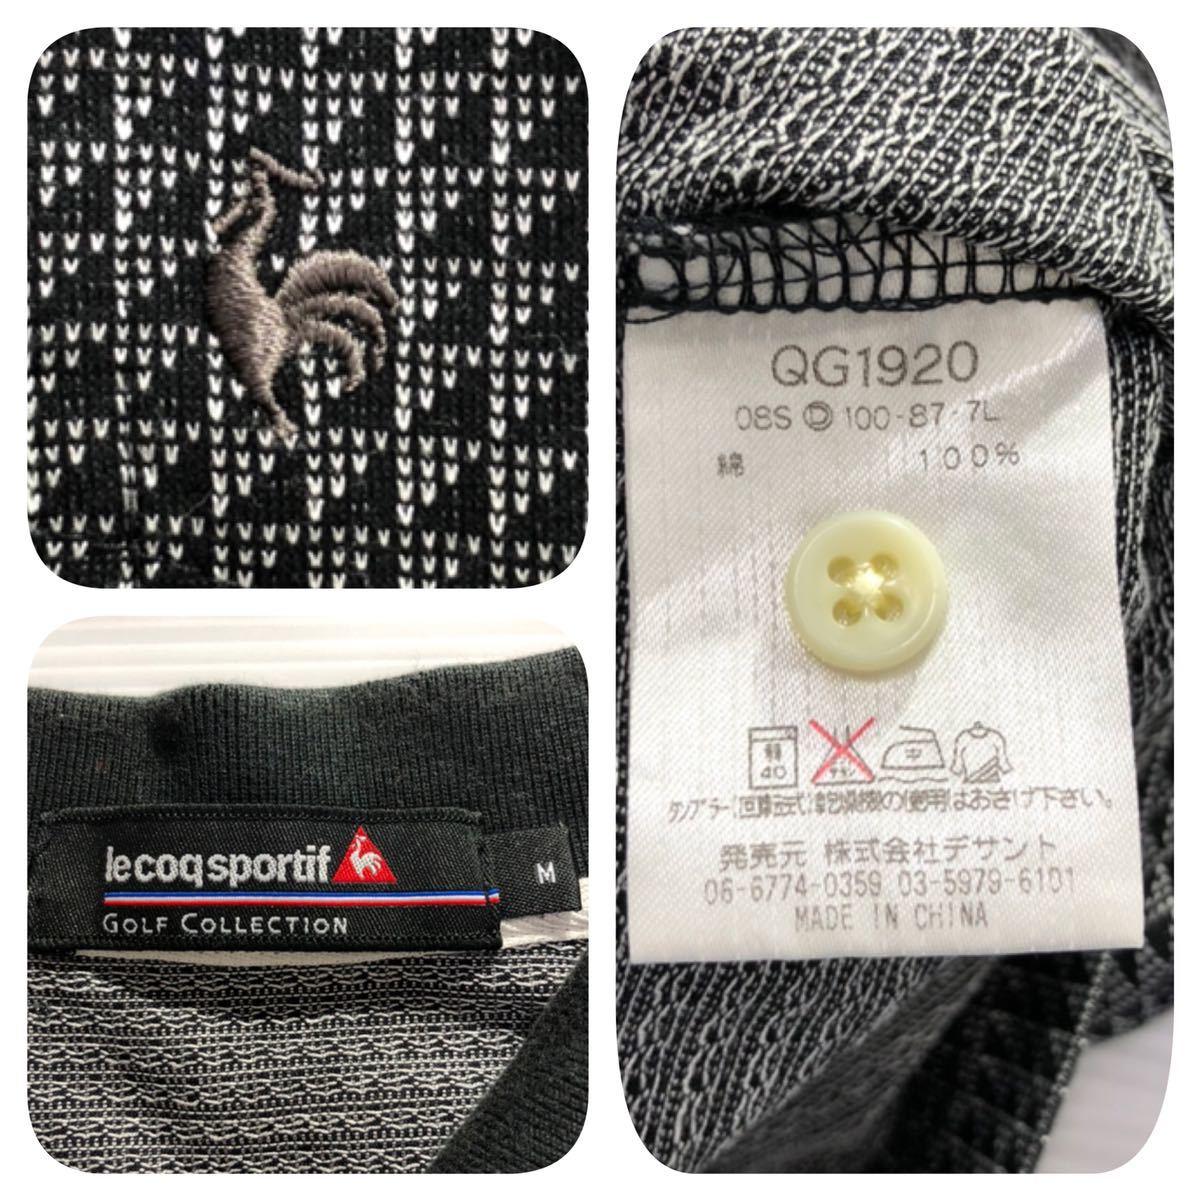 《le coq sportif GOLF ルコックゴルフ》ロゴ刺繍 総柄 半袖 ポロシャツ グレー×ブラック M_画像5